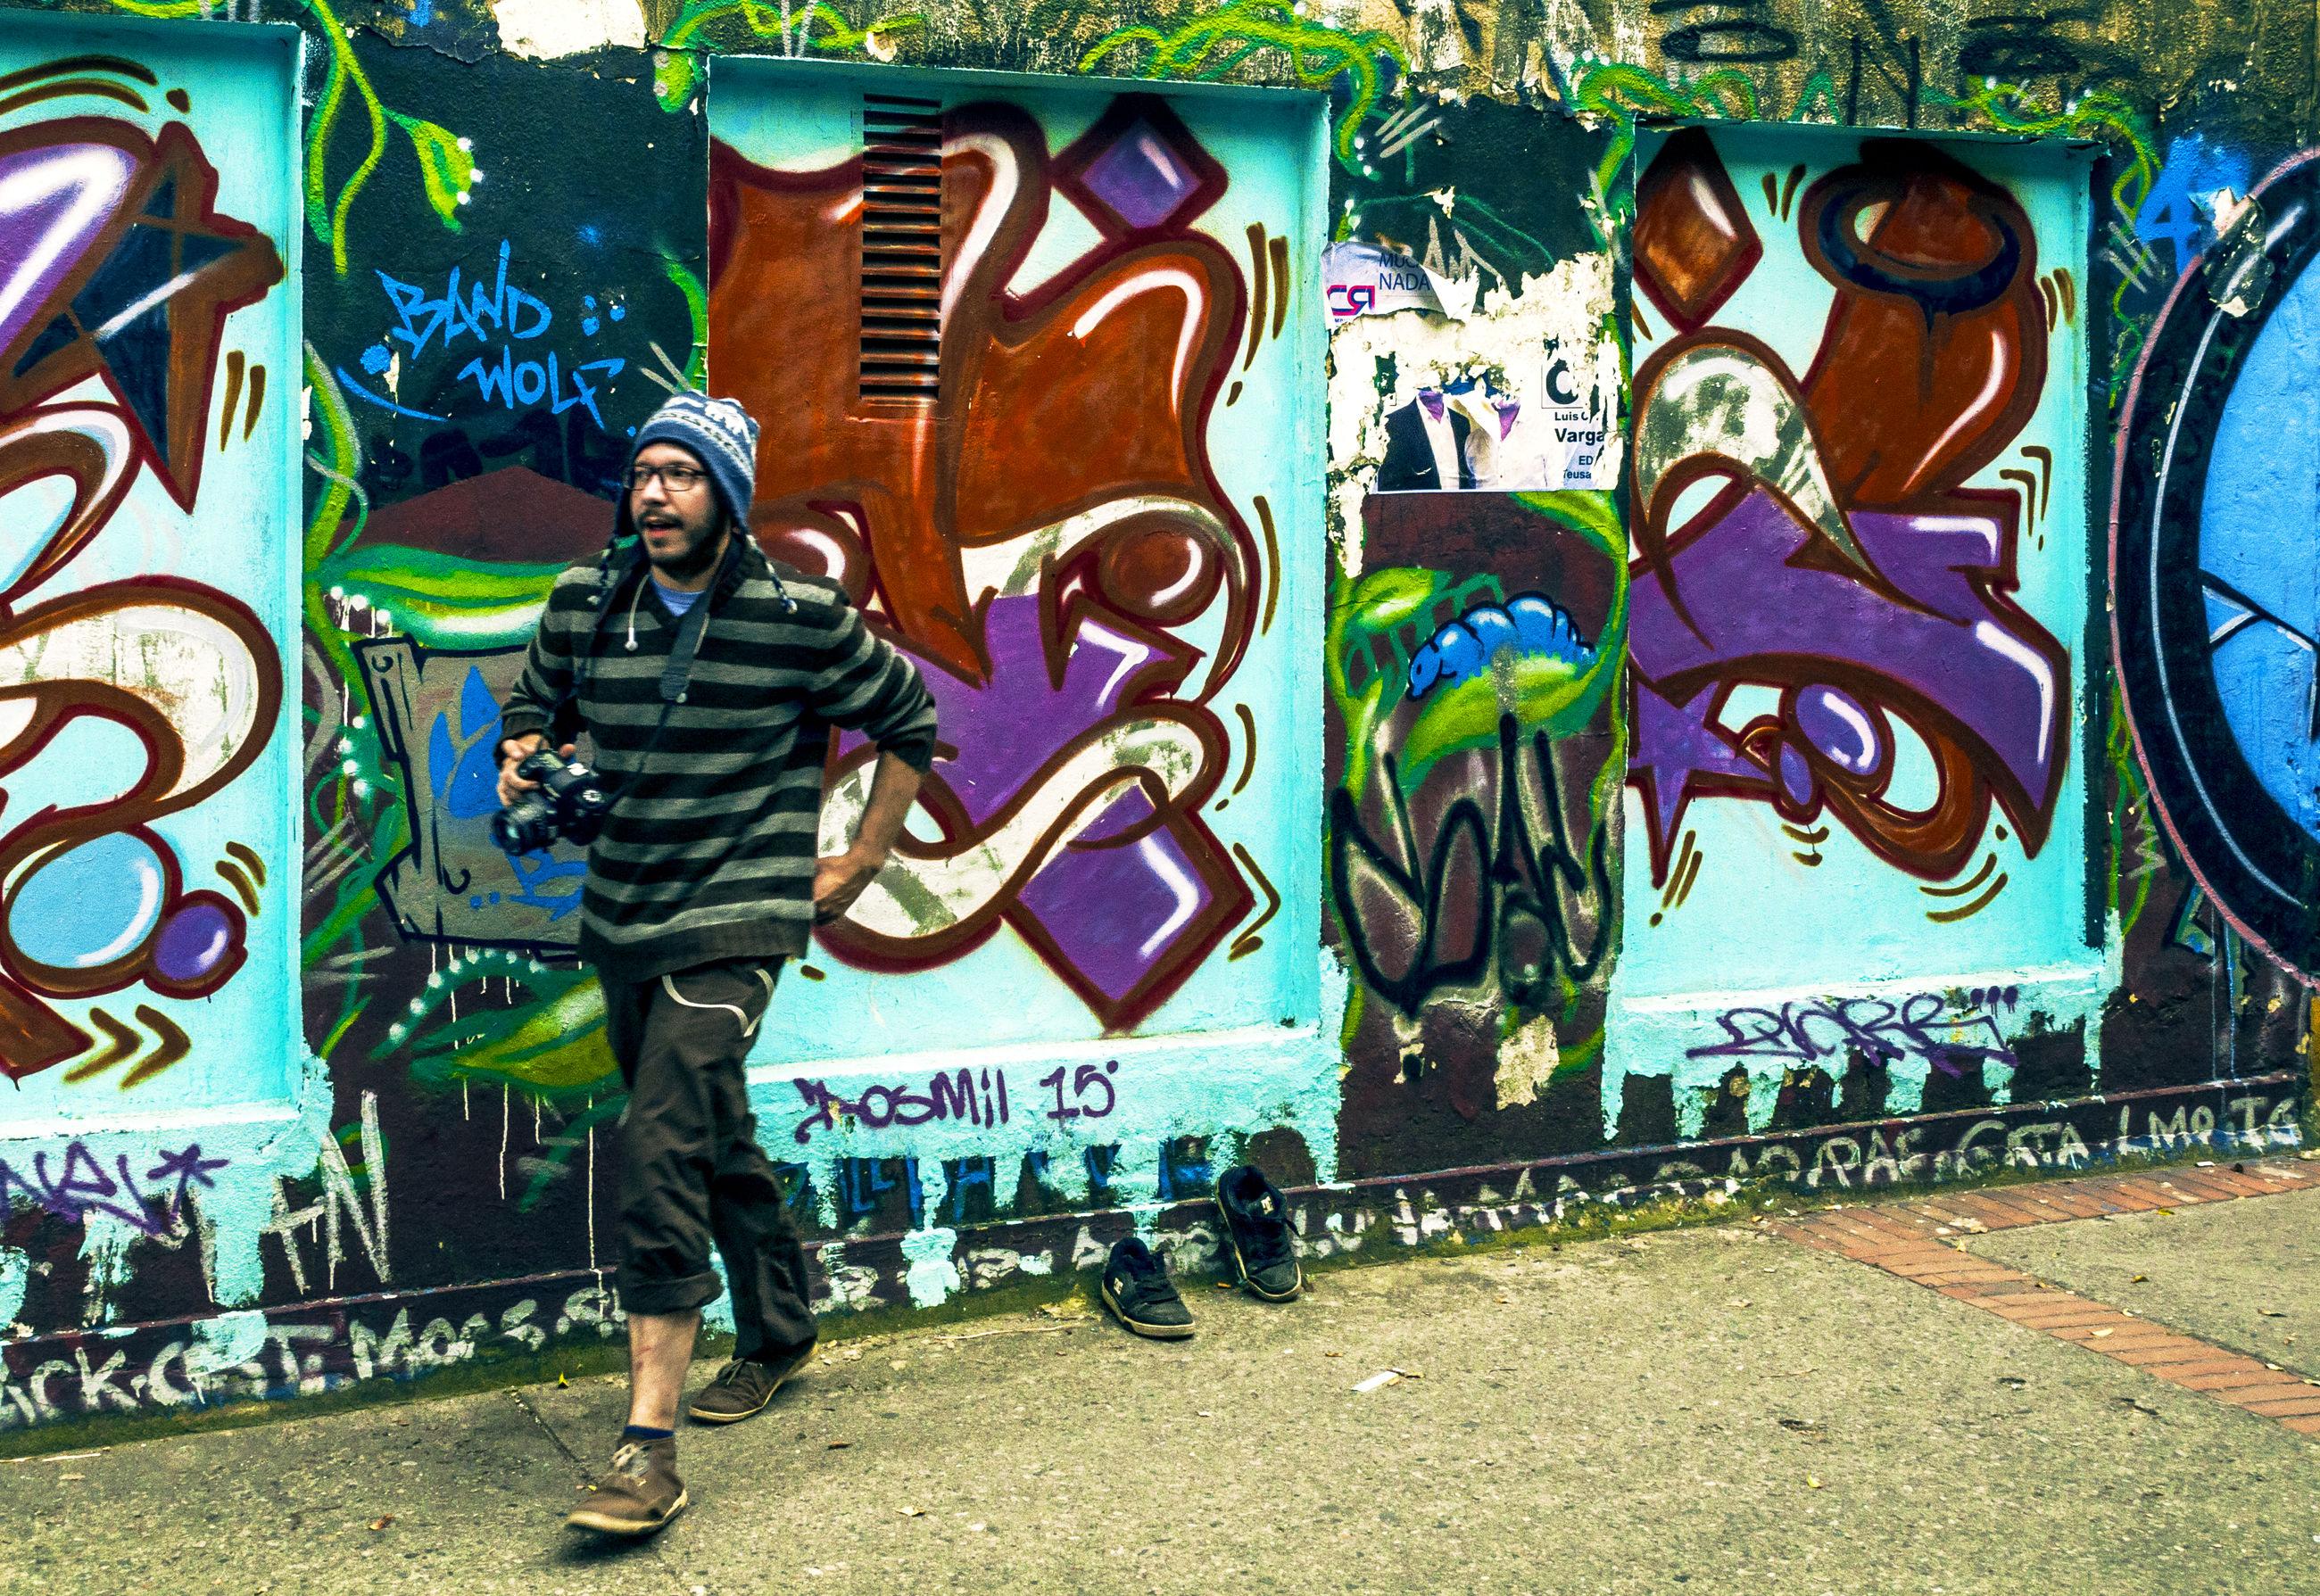 art and craft, art, graffiti, creativity, men, street, architecture, built structure, lifestyles, building exterior, day, outdoors, human representation, person, sidewalk, standing, animal representation, shoe